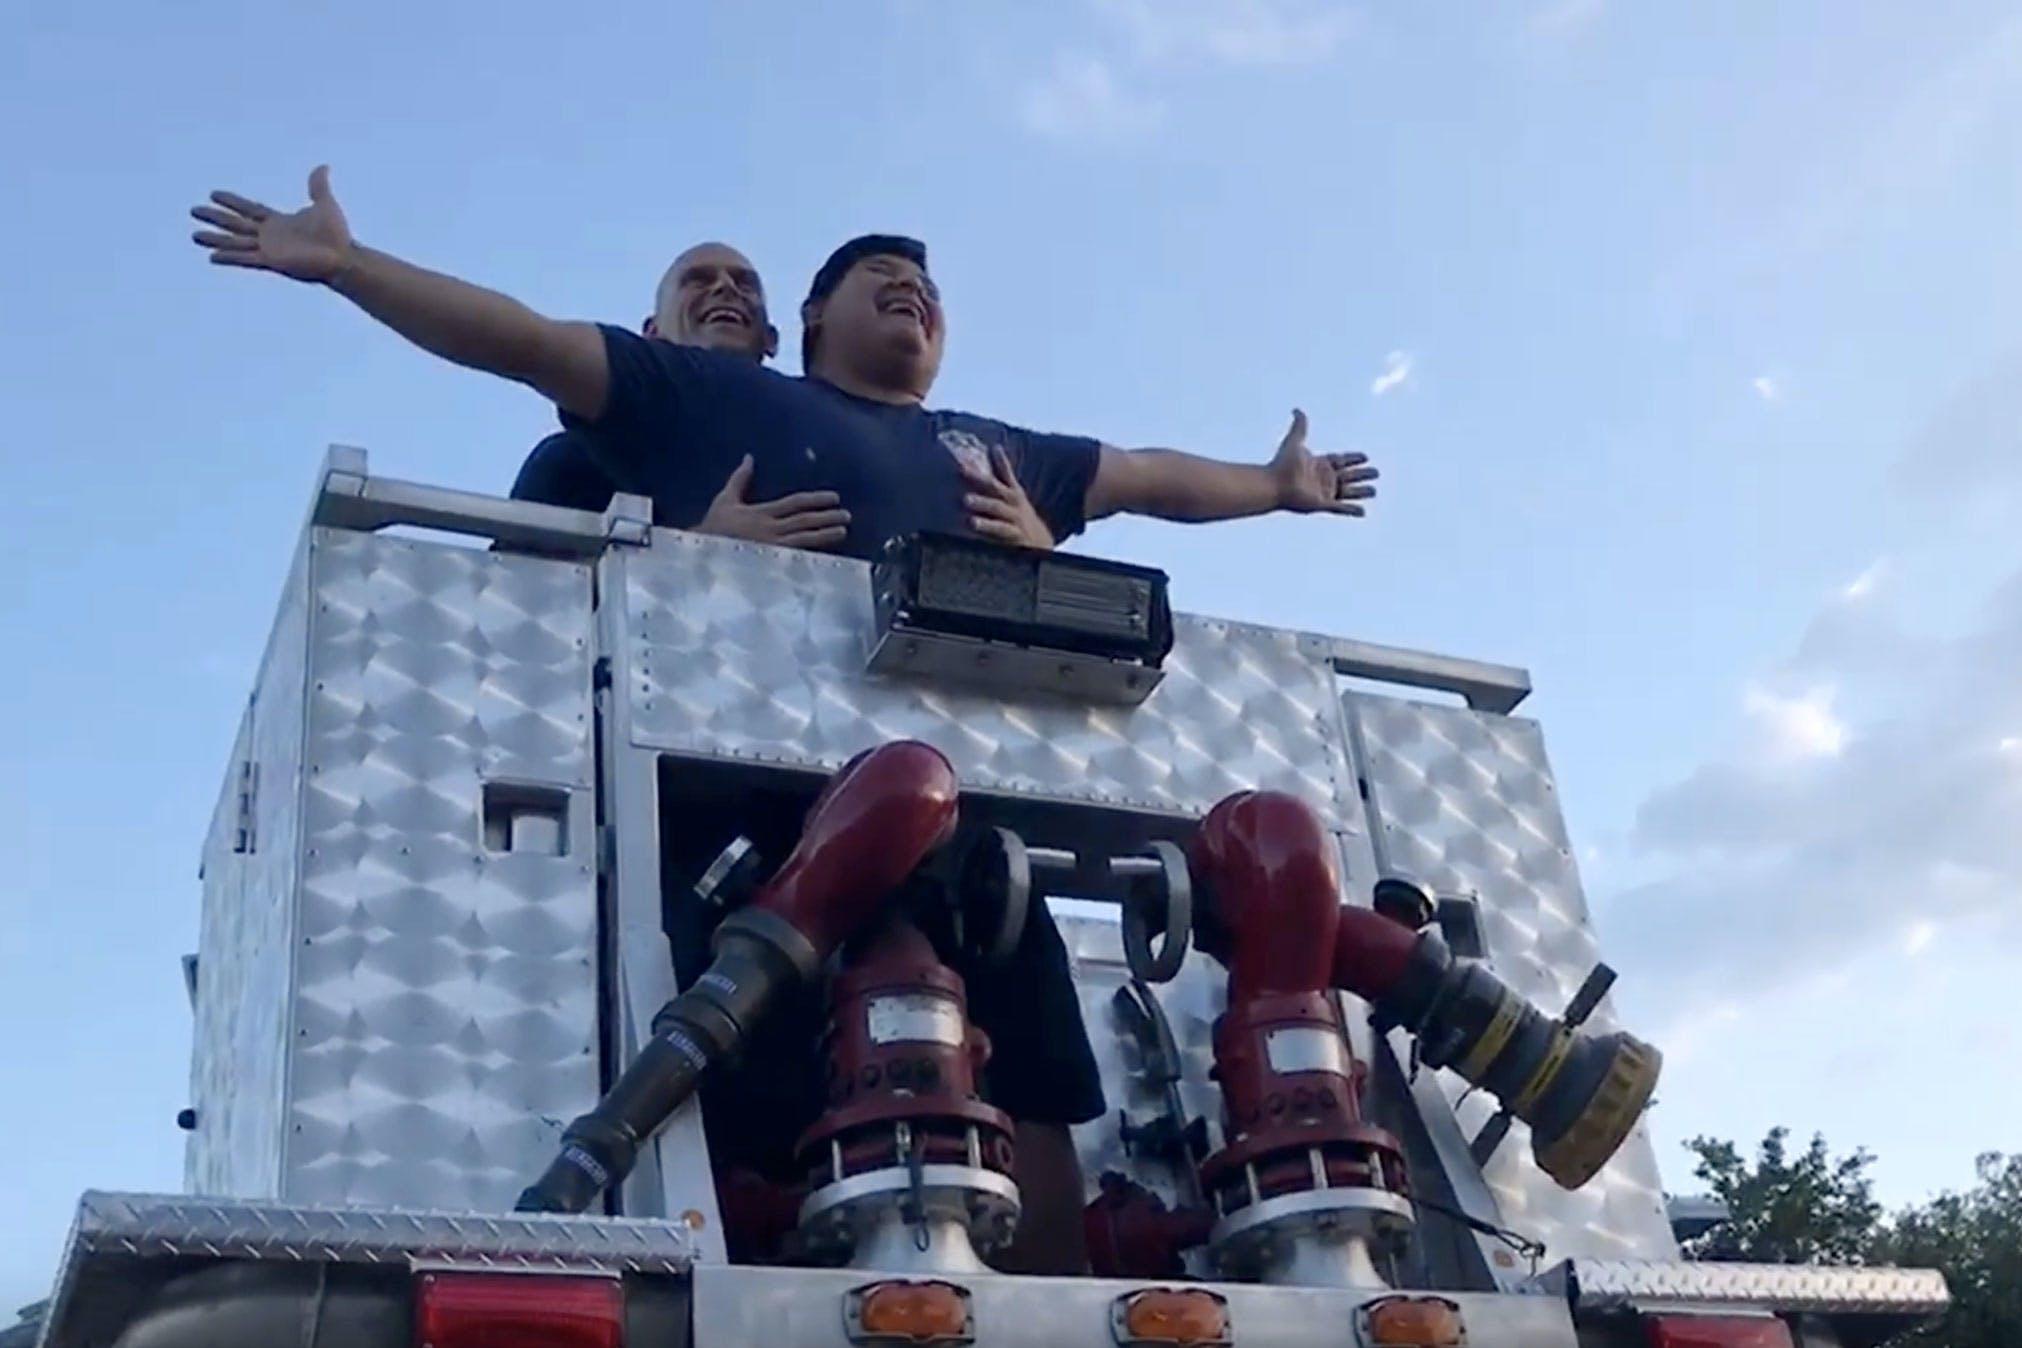 stafford-texas-fire-department-lip-sync-challenge